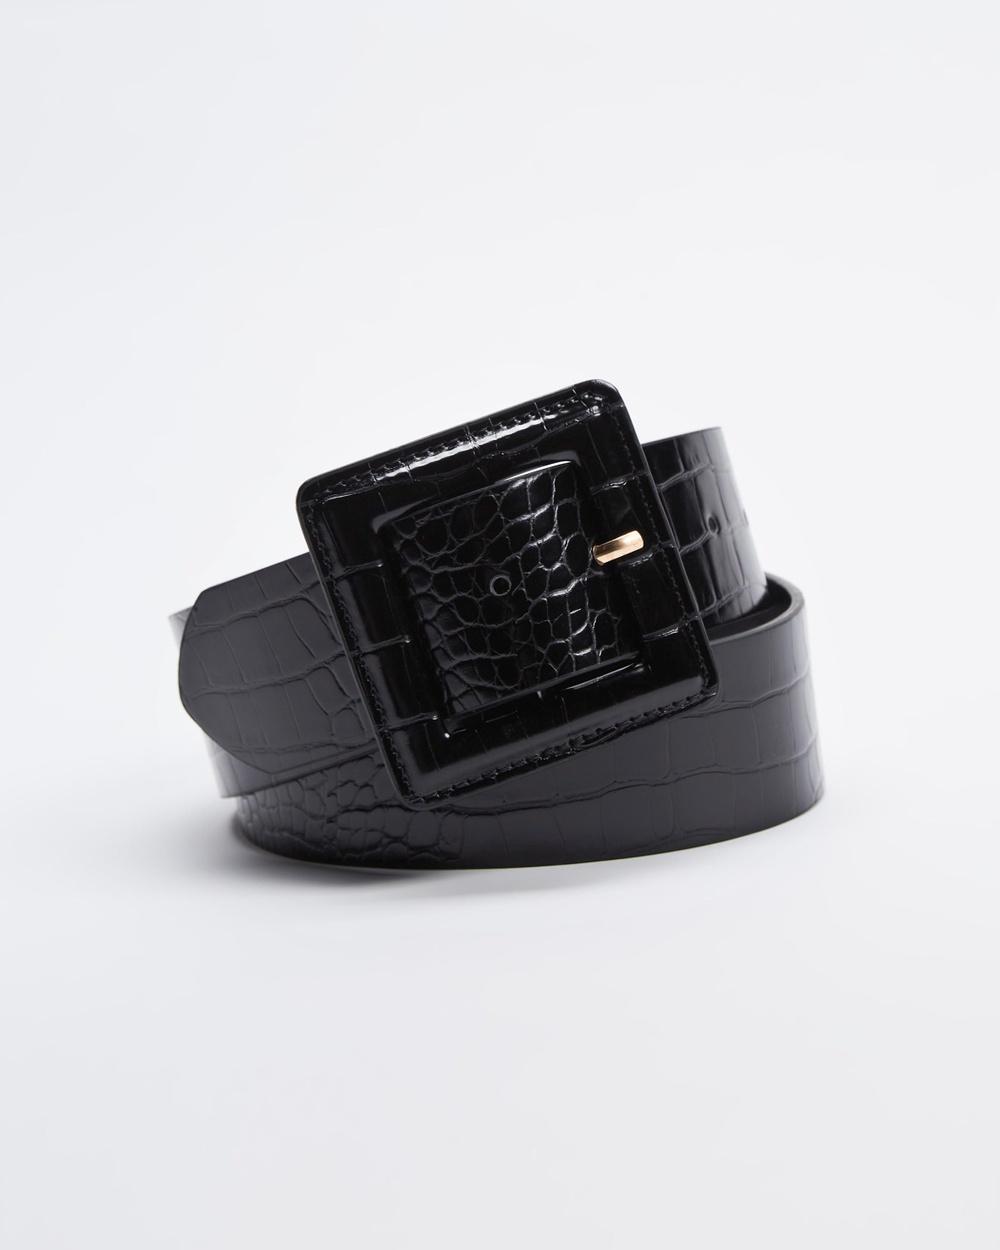 Atmos&Here Tina Square Buckle Belt 43mm Belts Black Croc